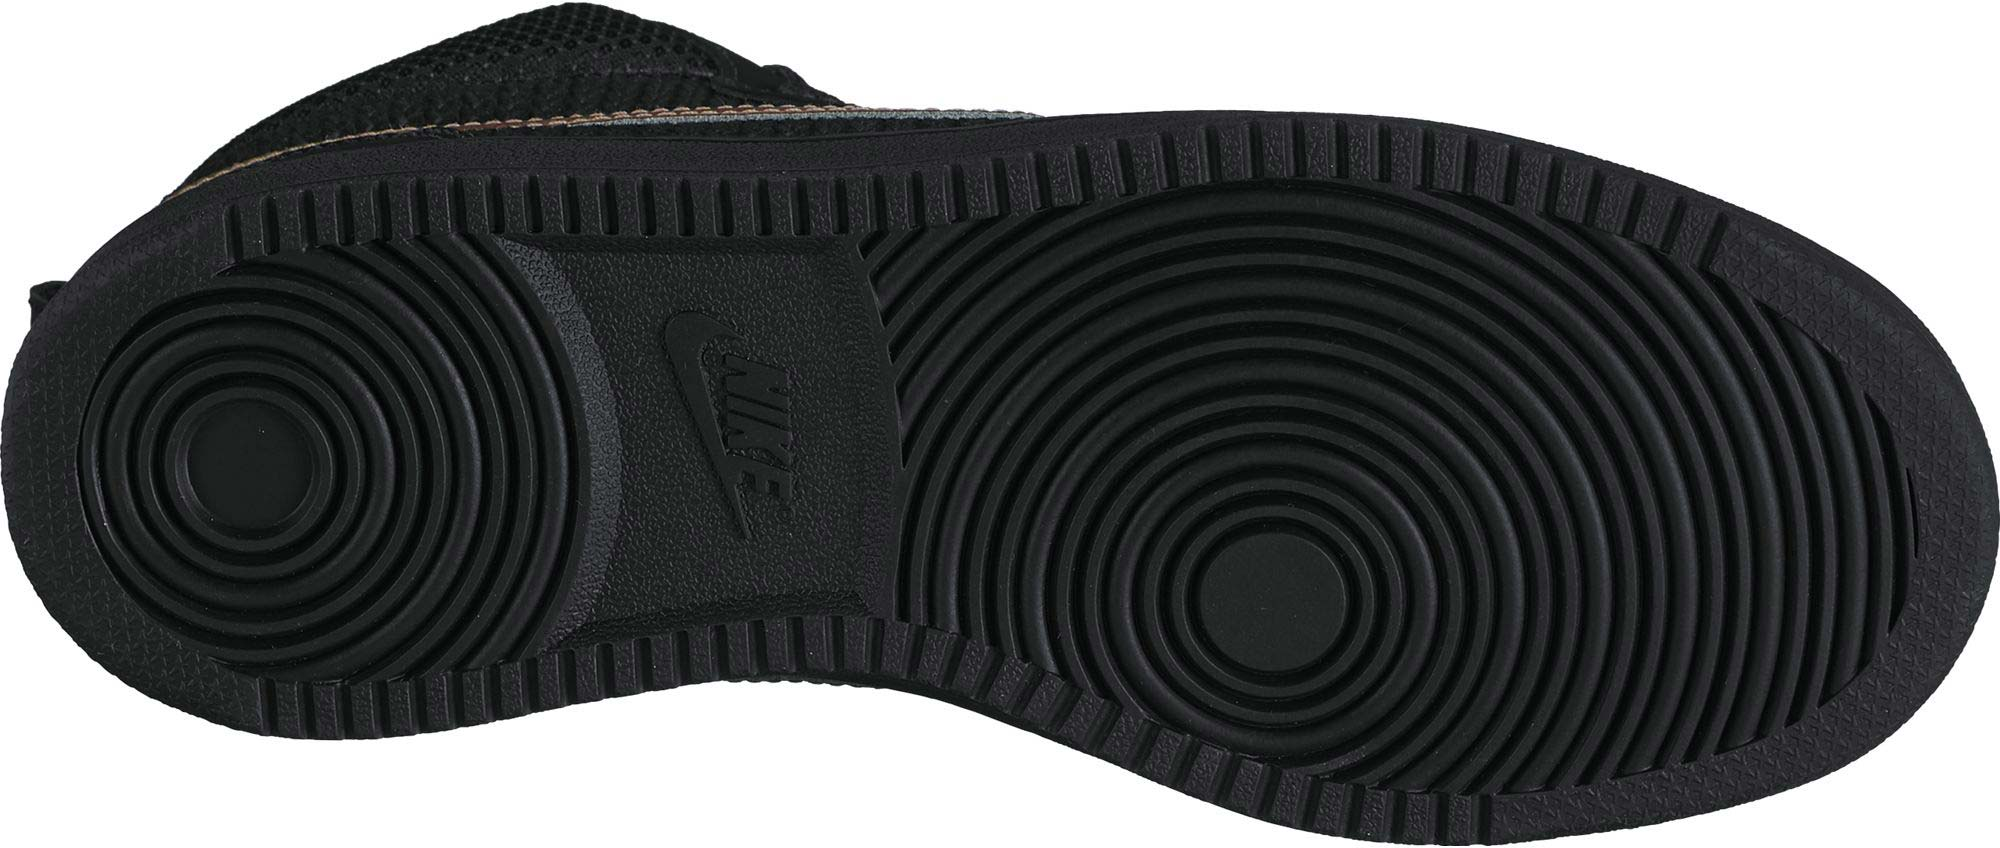 Nike RECREATION MID-TOP PREMIUM SHOE. Dámska voľnočasová obuv. Dámska  voľnočasová obuv c430351582d